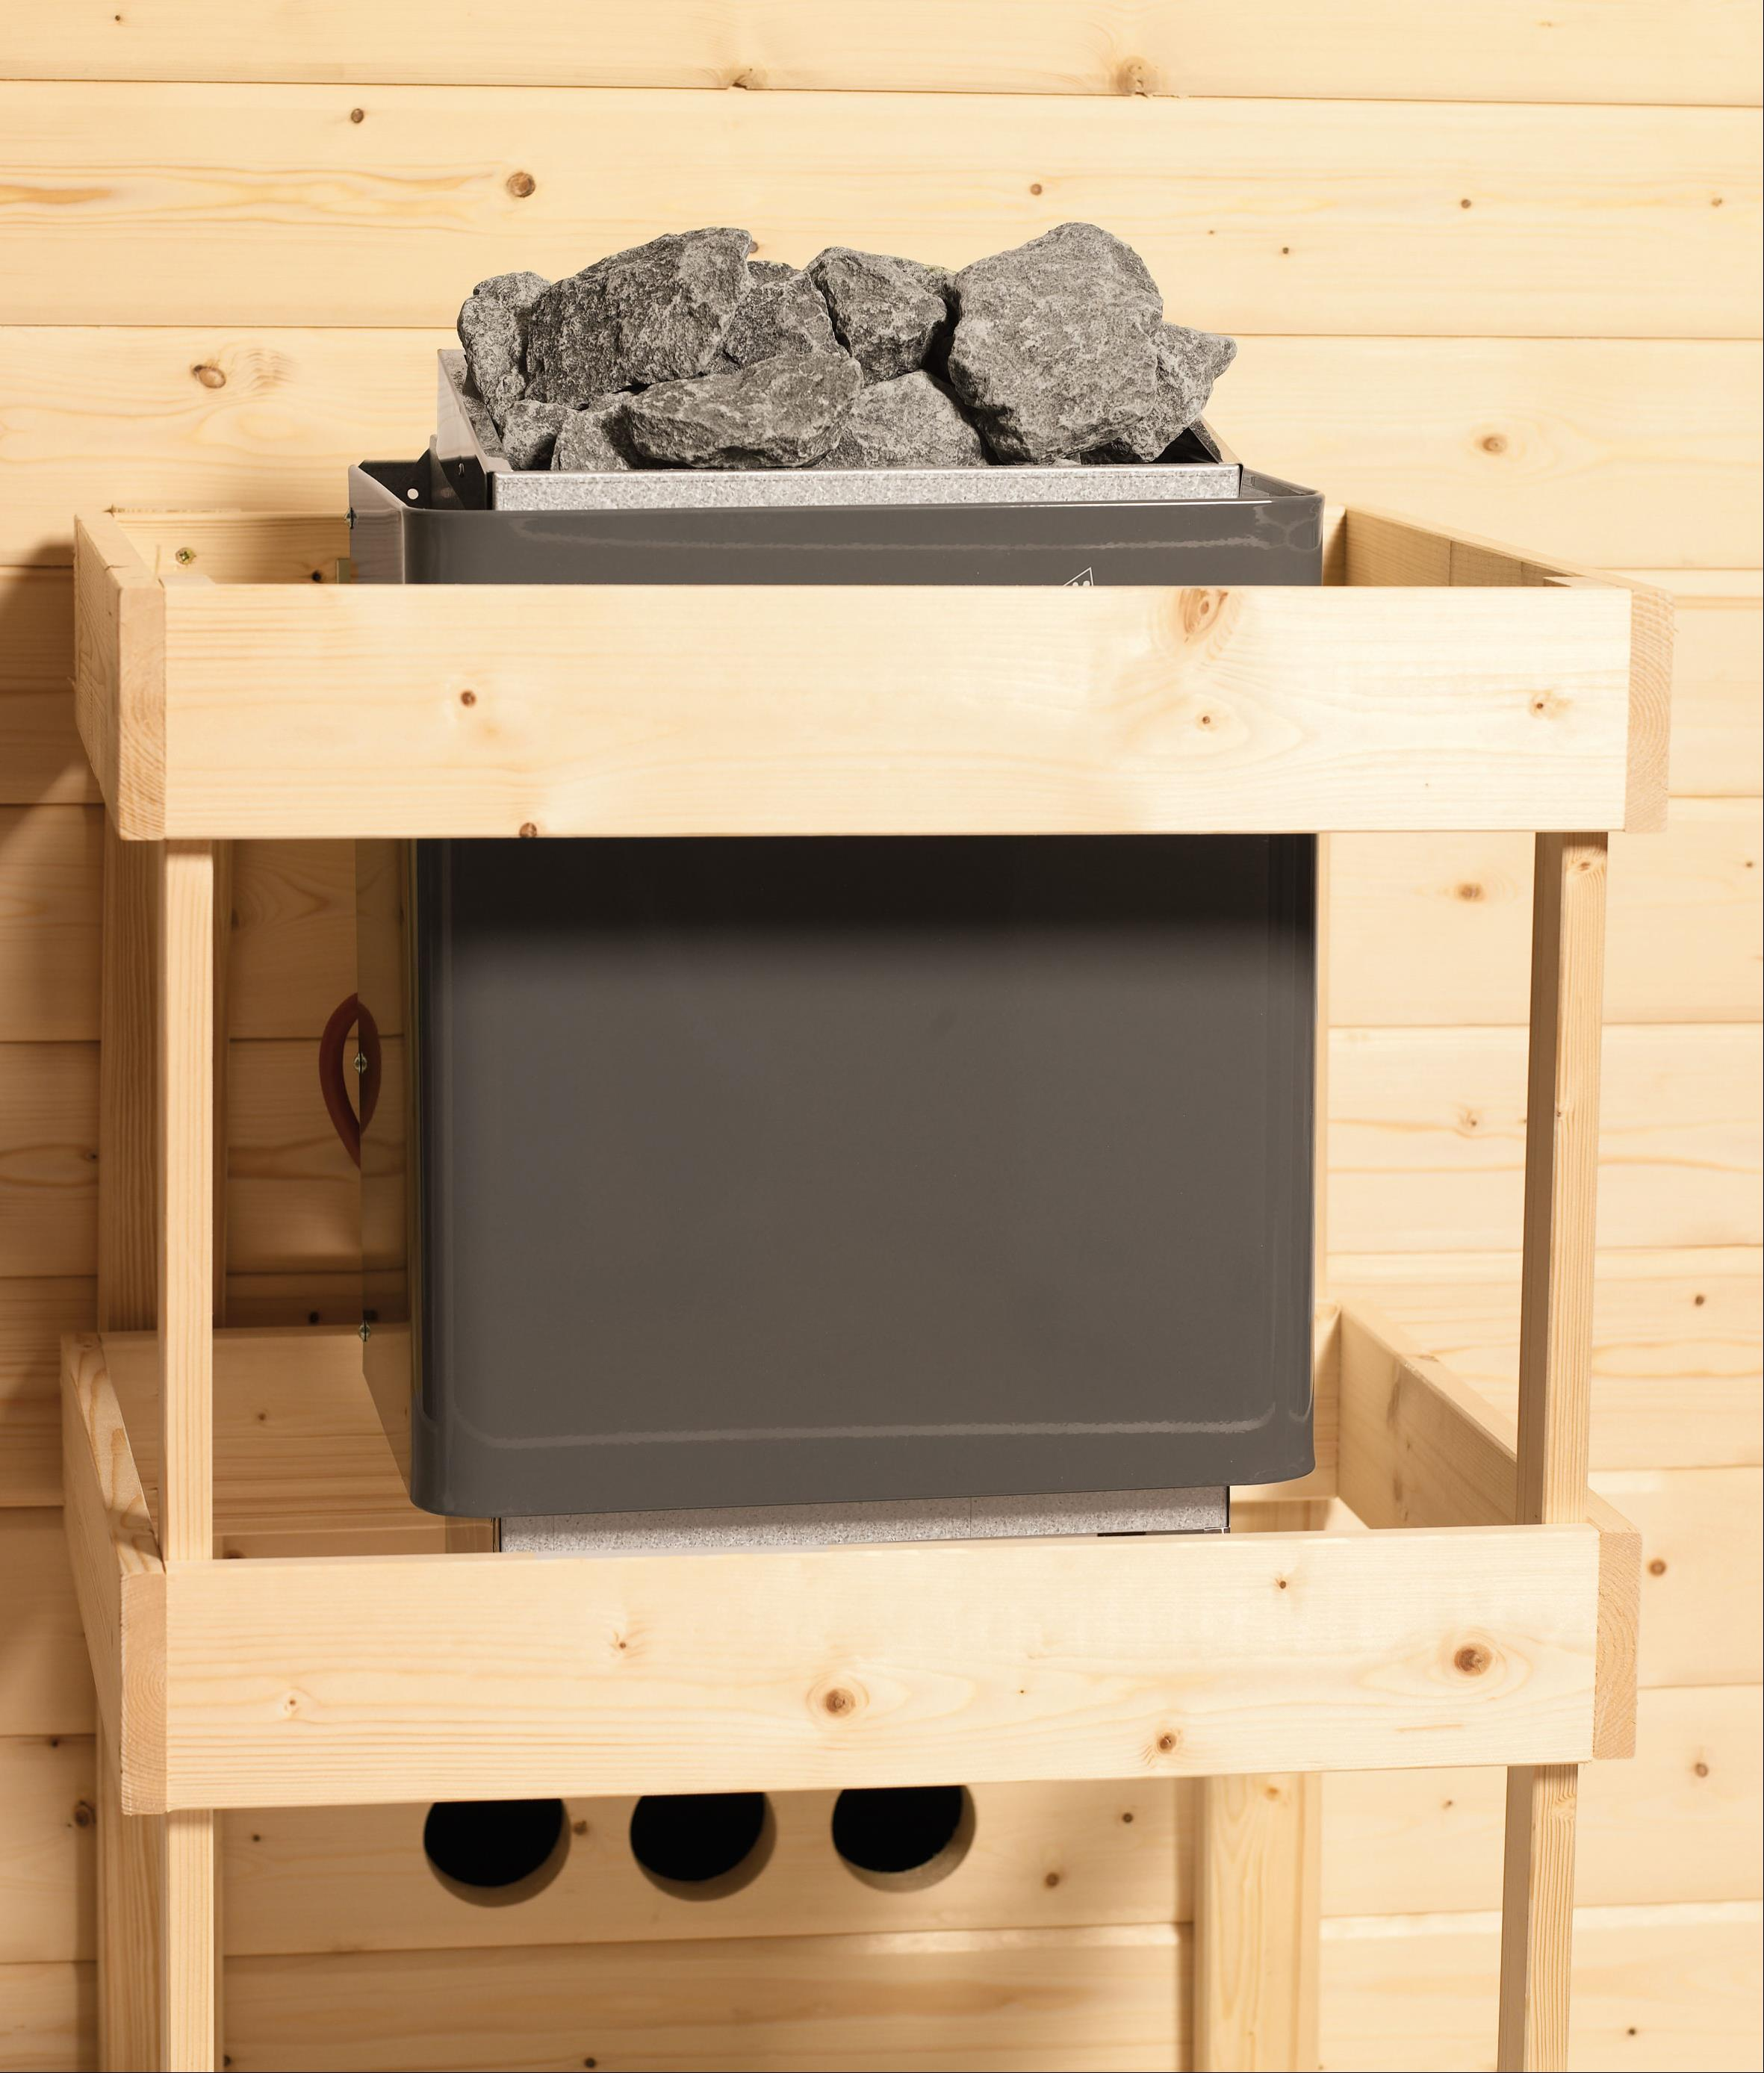 Gartensauna WoodFeeling Saunahaus Taina natur 38mm Saunaofen 9kW int. Bild 6